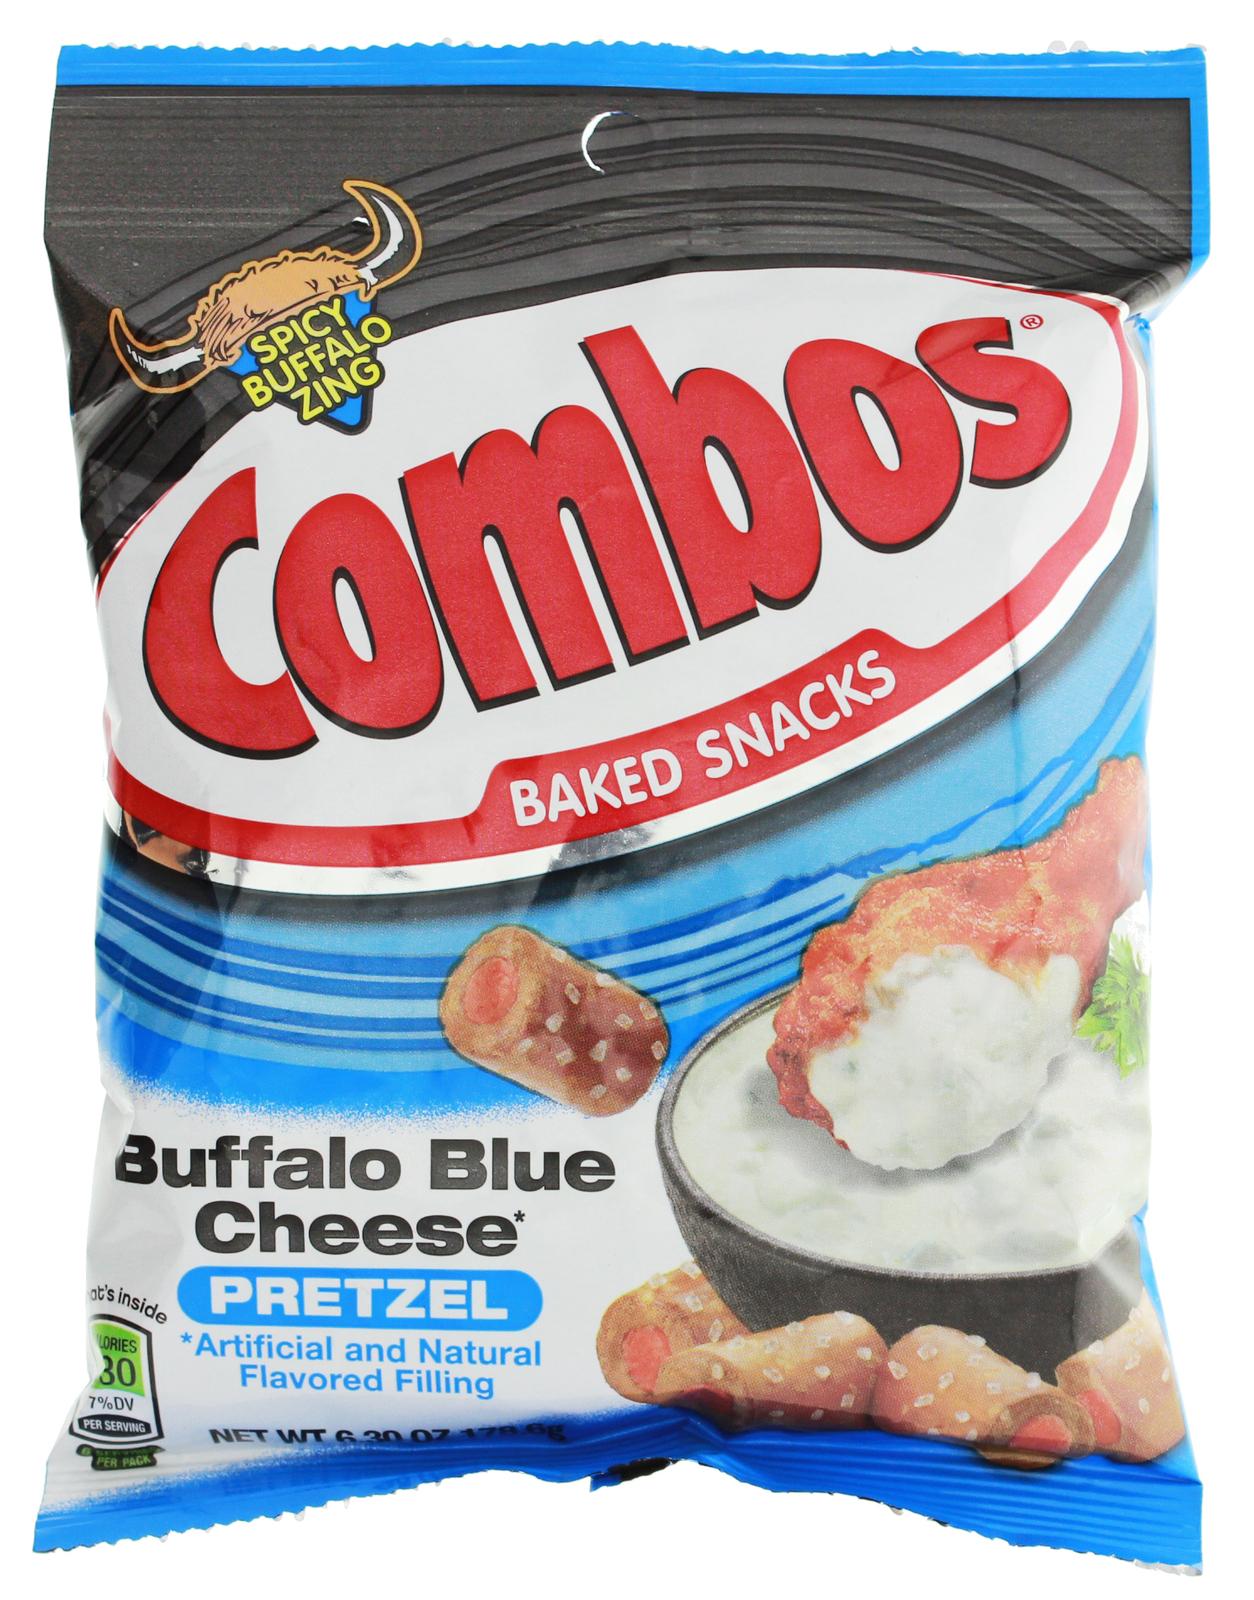 Combos Buffalo Blue Cheese Pretzel Baked Snacks (178.6g) image